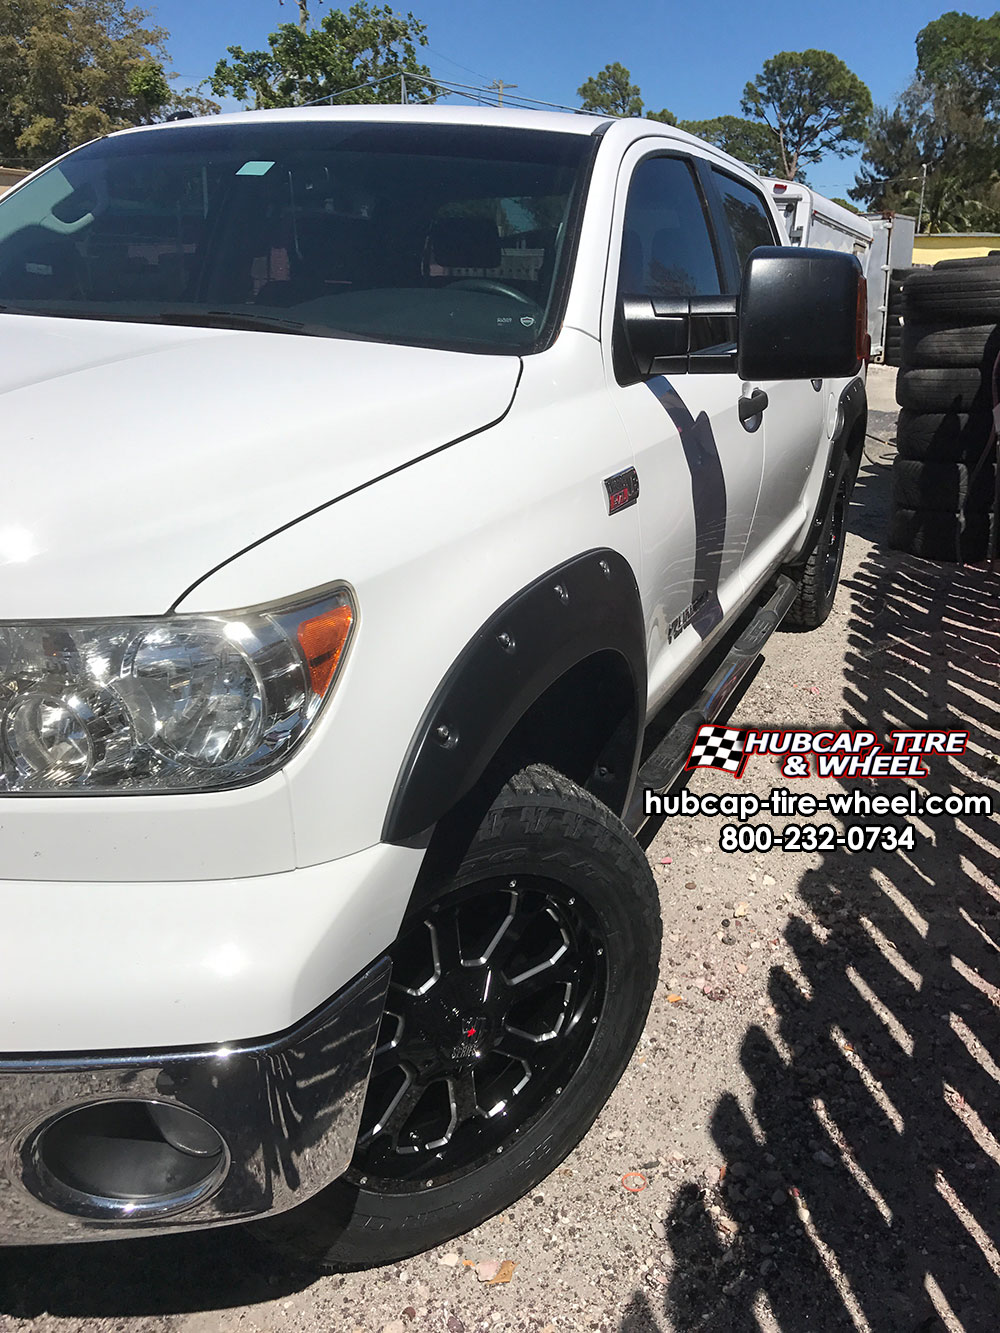 2012 Toyota Tundra SR5 XD Series XD825 Buck 25 Wheels Rims